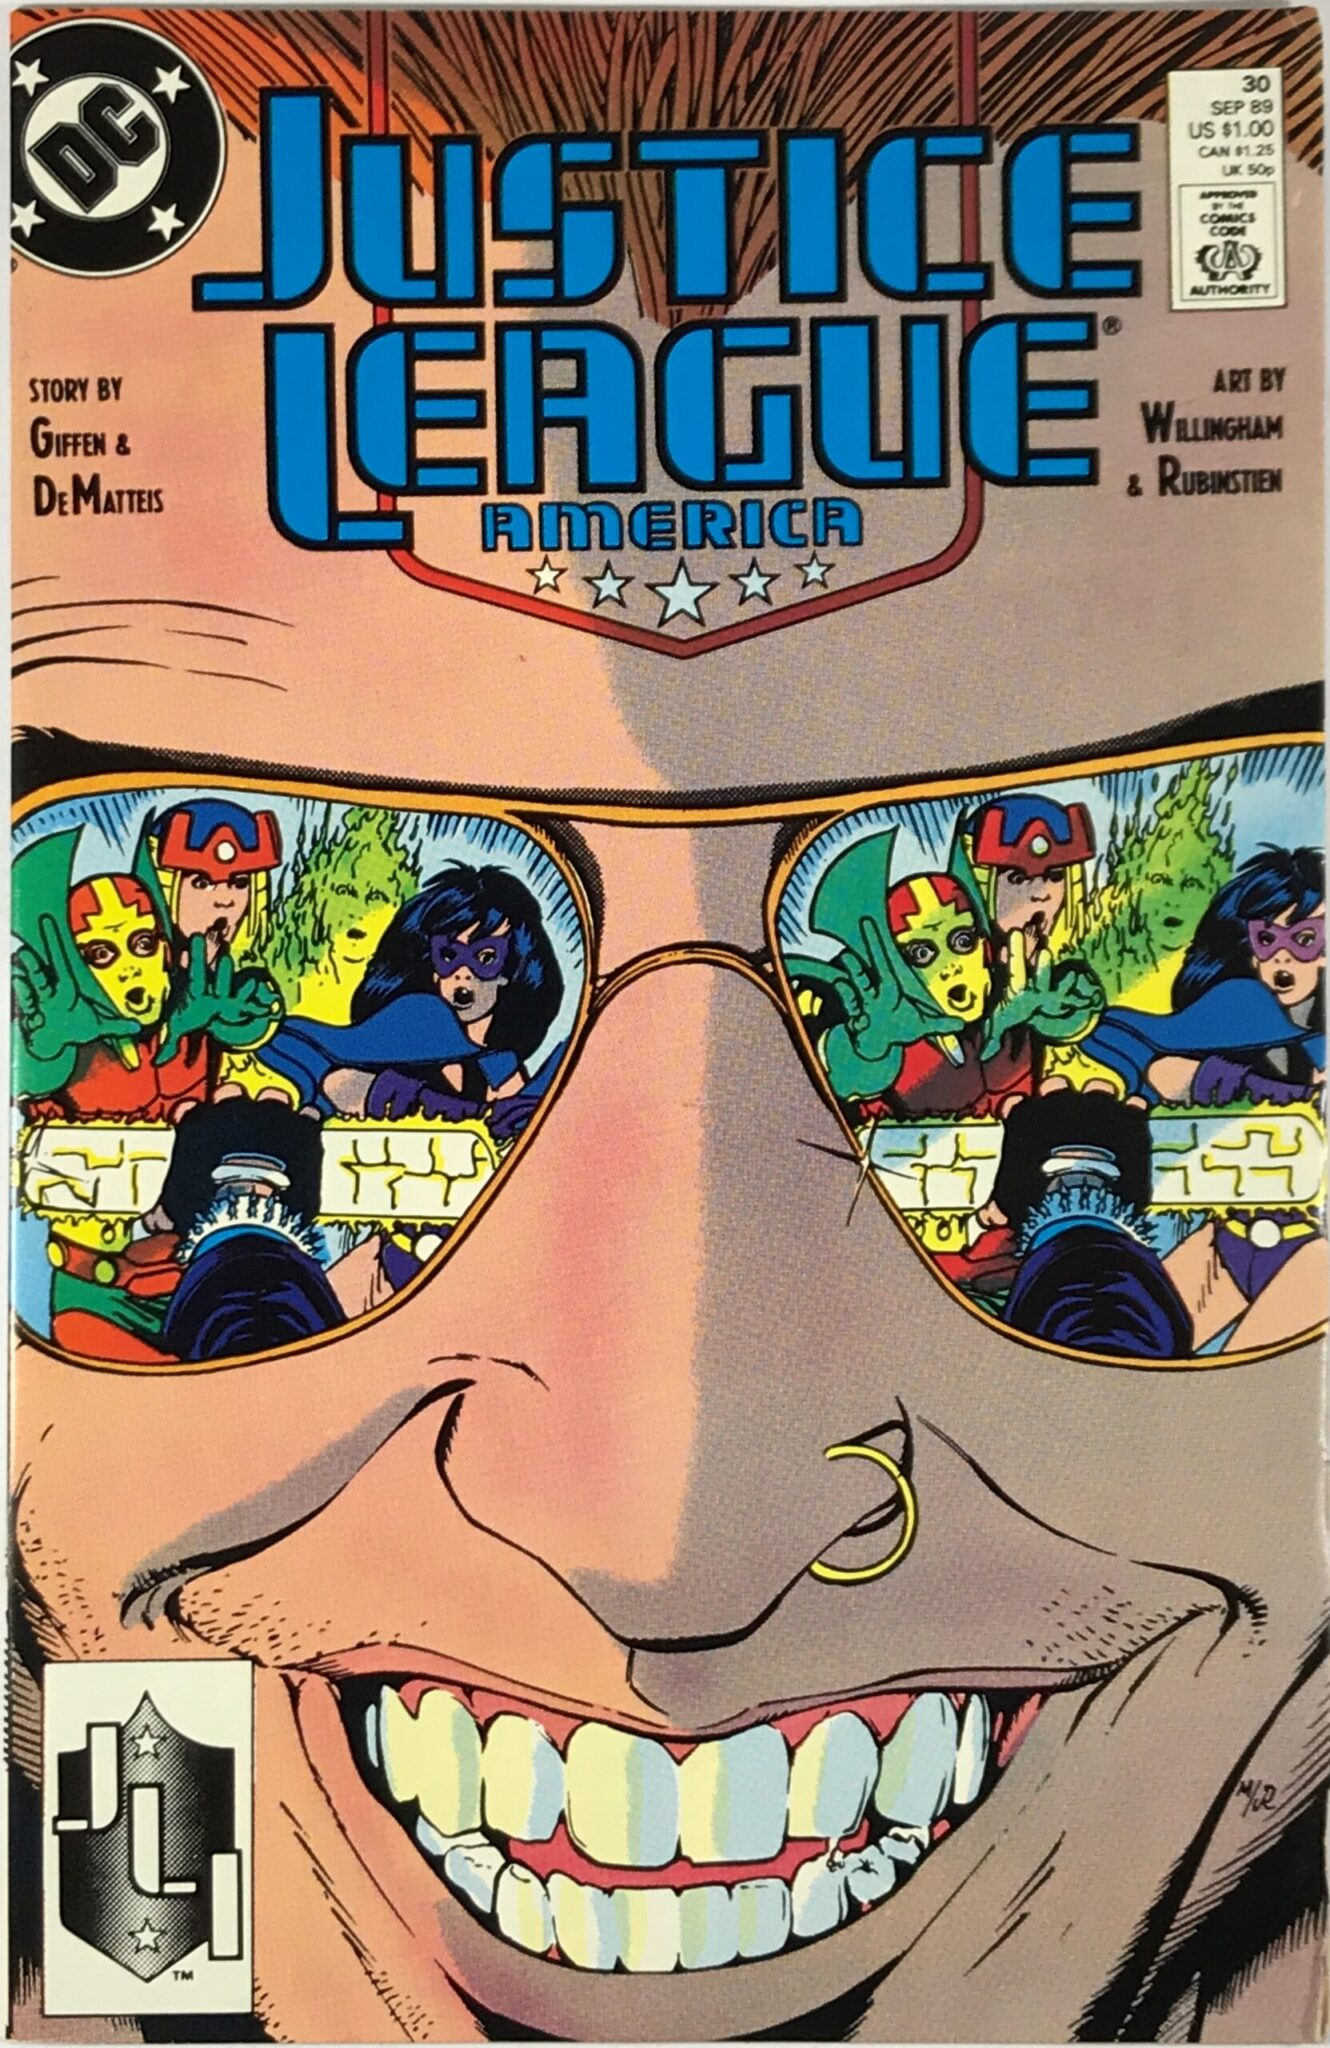 Justice League America (1989-1996) #30 - Very Good 1